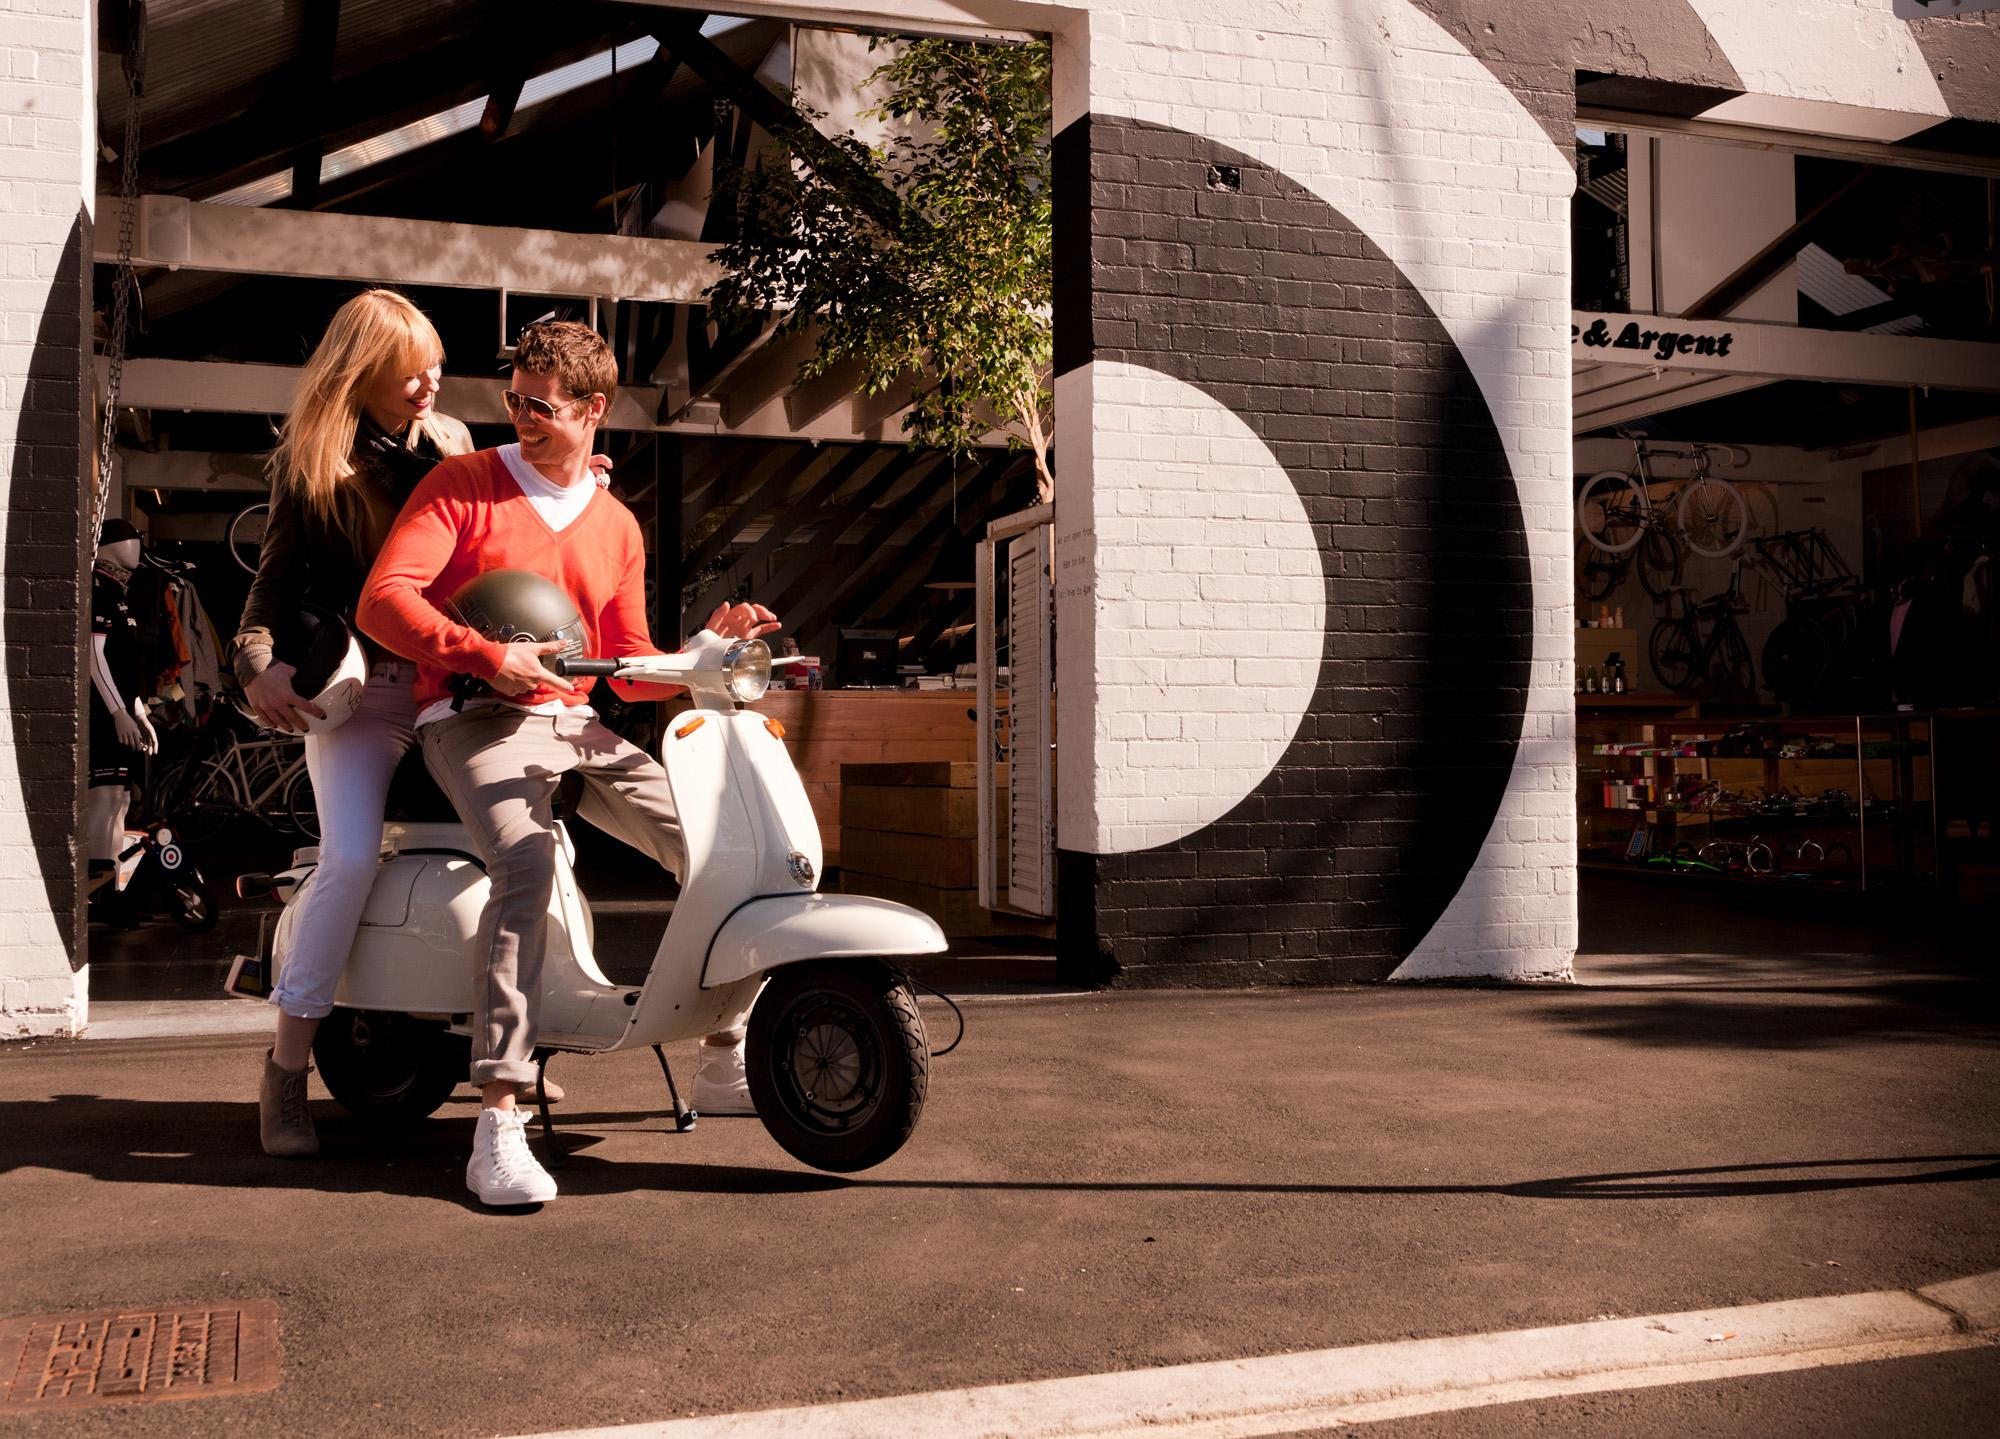 Scooter-4943.jpg